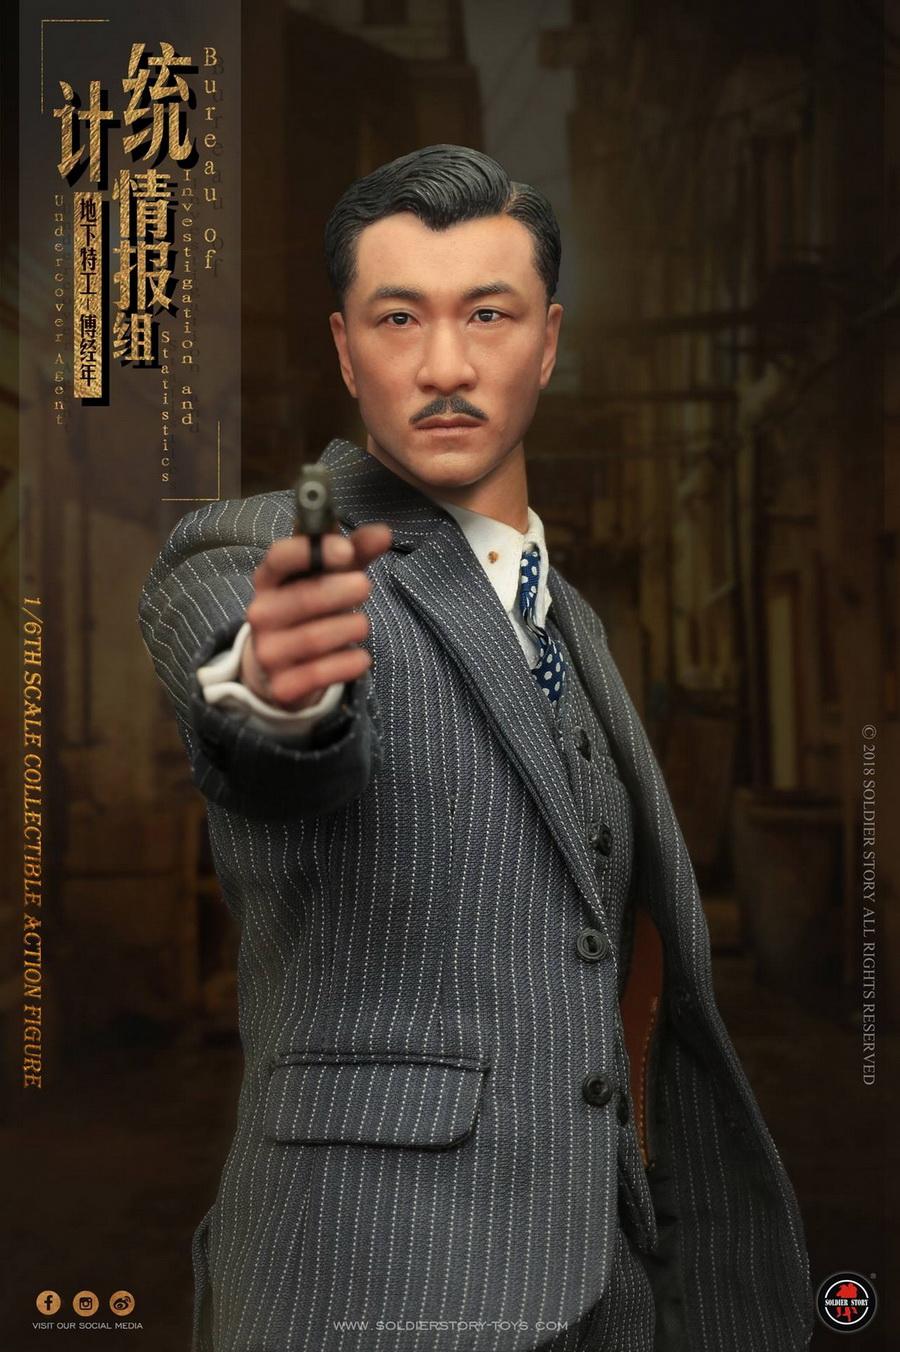 sost-Undercover Agent03